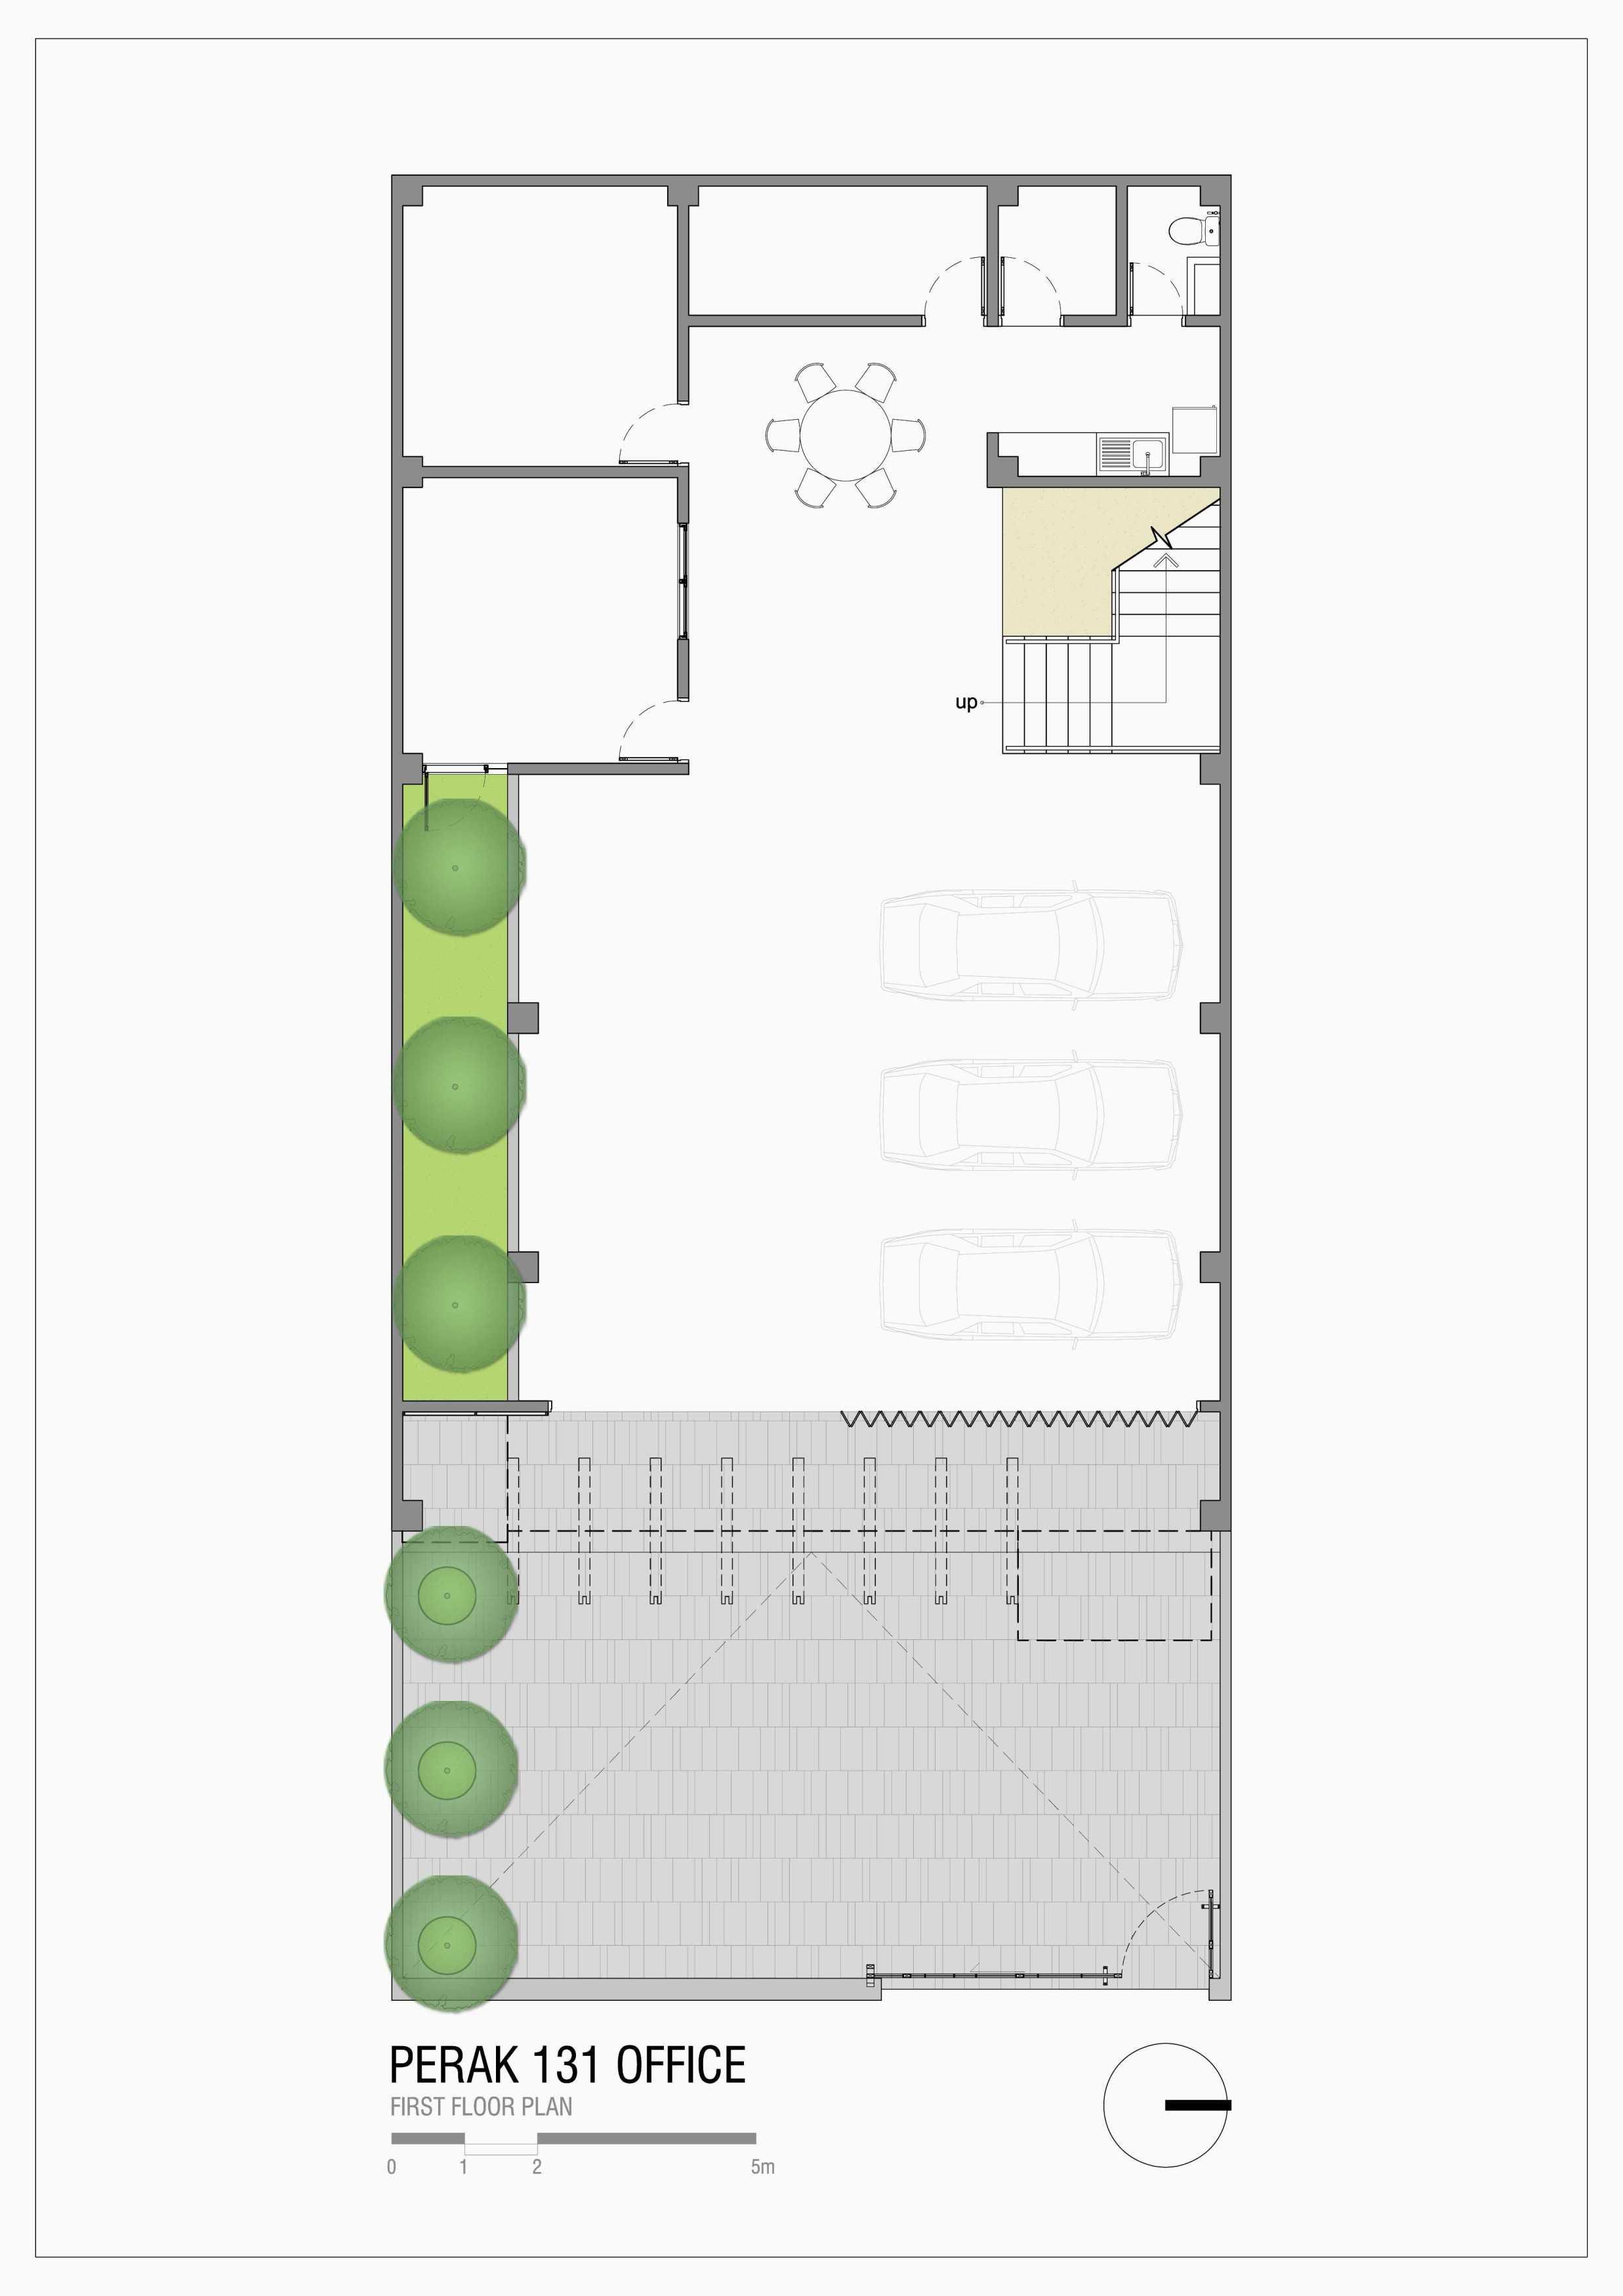 Simple Projects Architecture Pb131 Office Jl.perak Barat 131, Surabaya - Indonesia Jl.perak Barat 131, Surabaya - Indonesia Simple-Projects-Architecture-Pb131-Office   59147